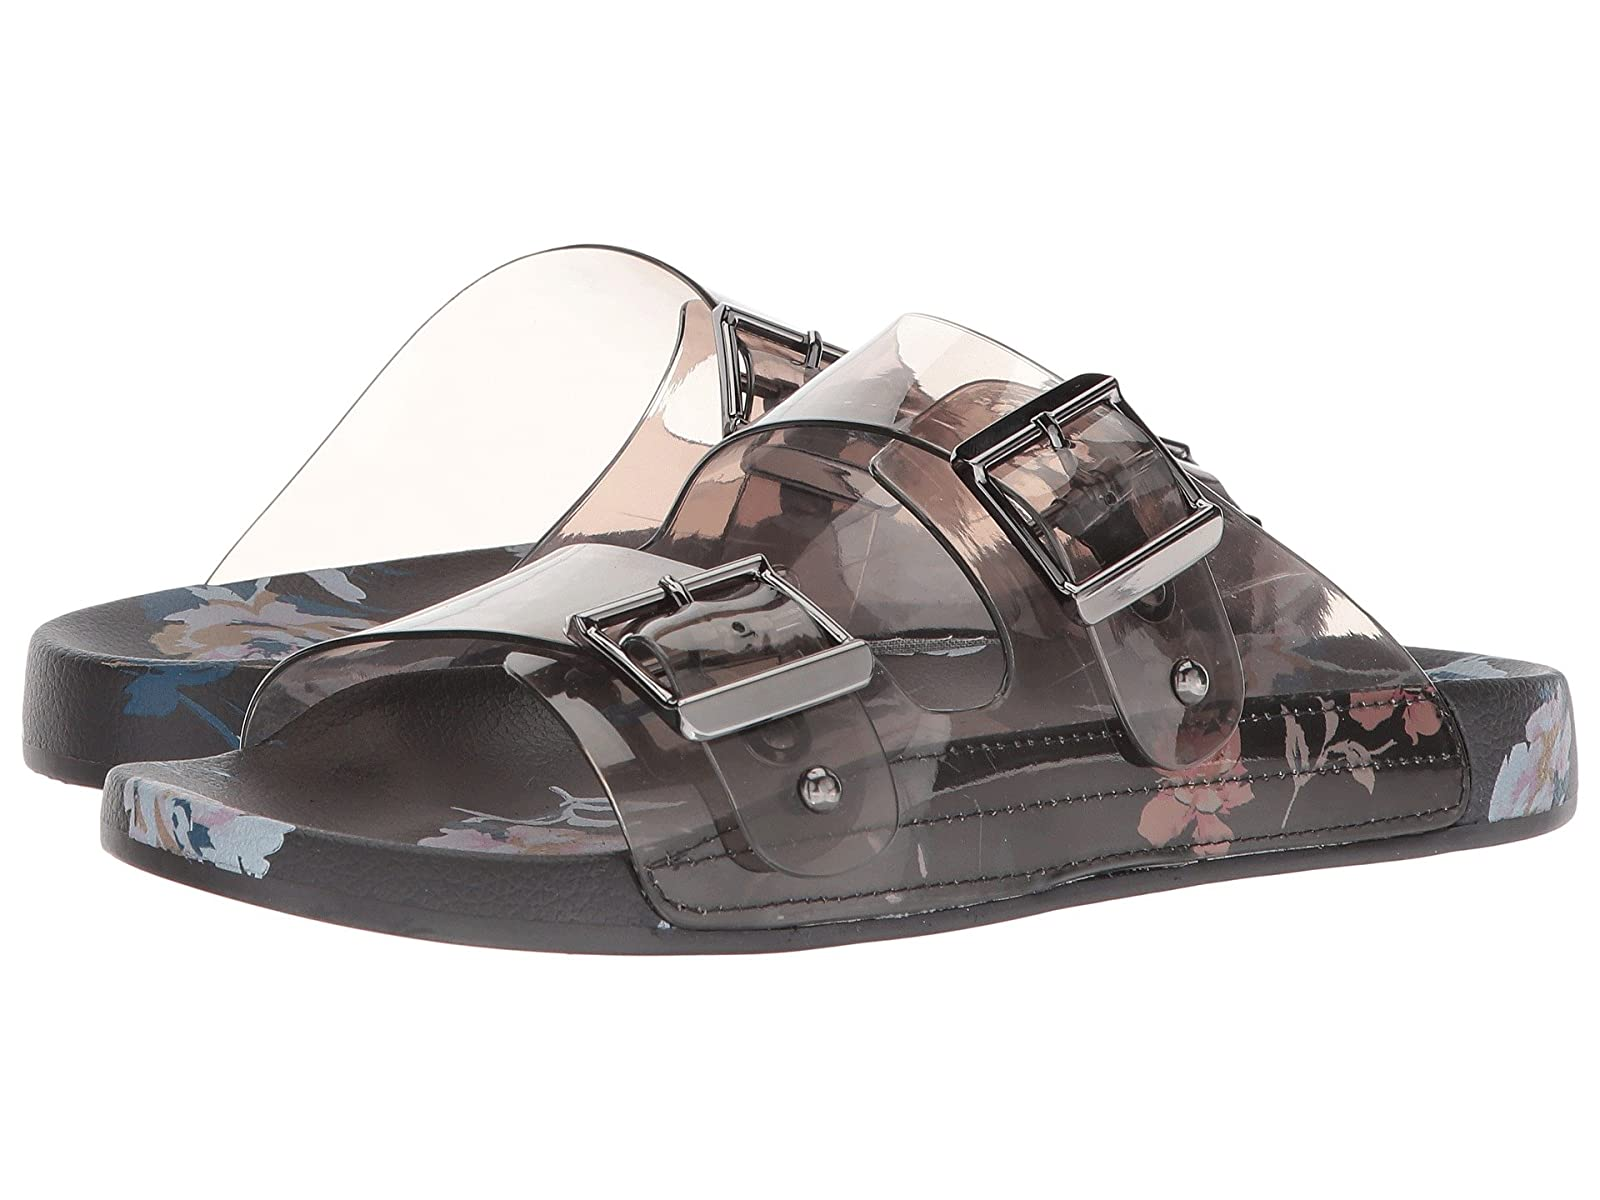 Jessica Simpson PrespenAtmospheric grades have affordable shoes